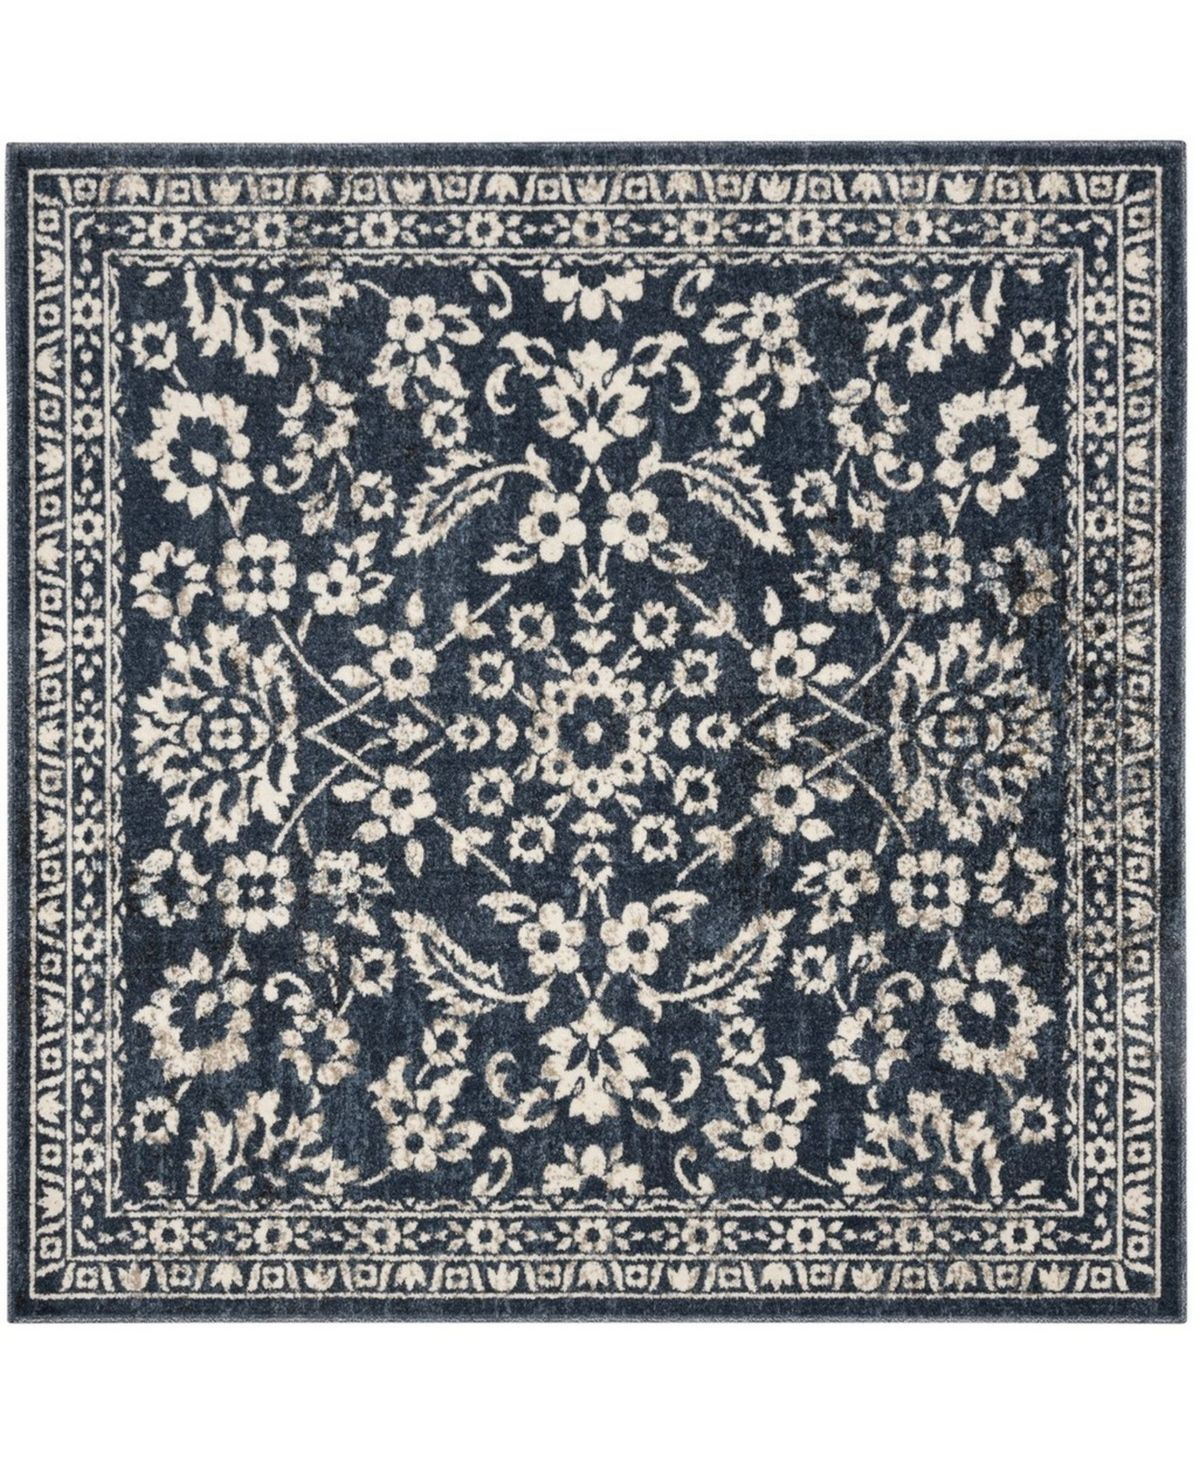 Safavieh Carolina Dark Blue 5 1 X 5 1 Square Area Rug Reviews Rugs Macy S Plush Area Rugs Classic Rugs Family Room Decorating